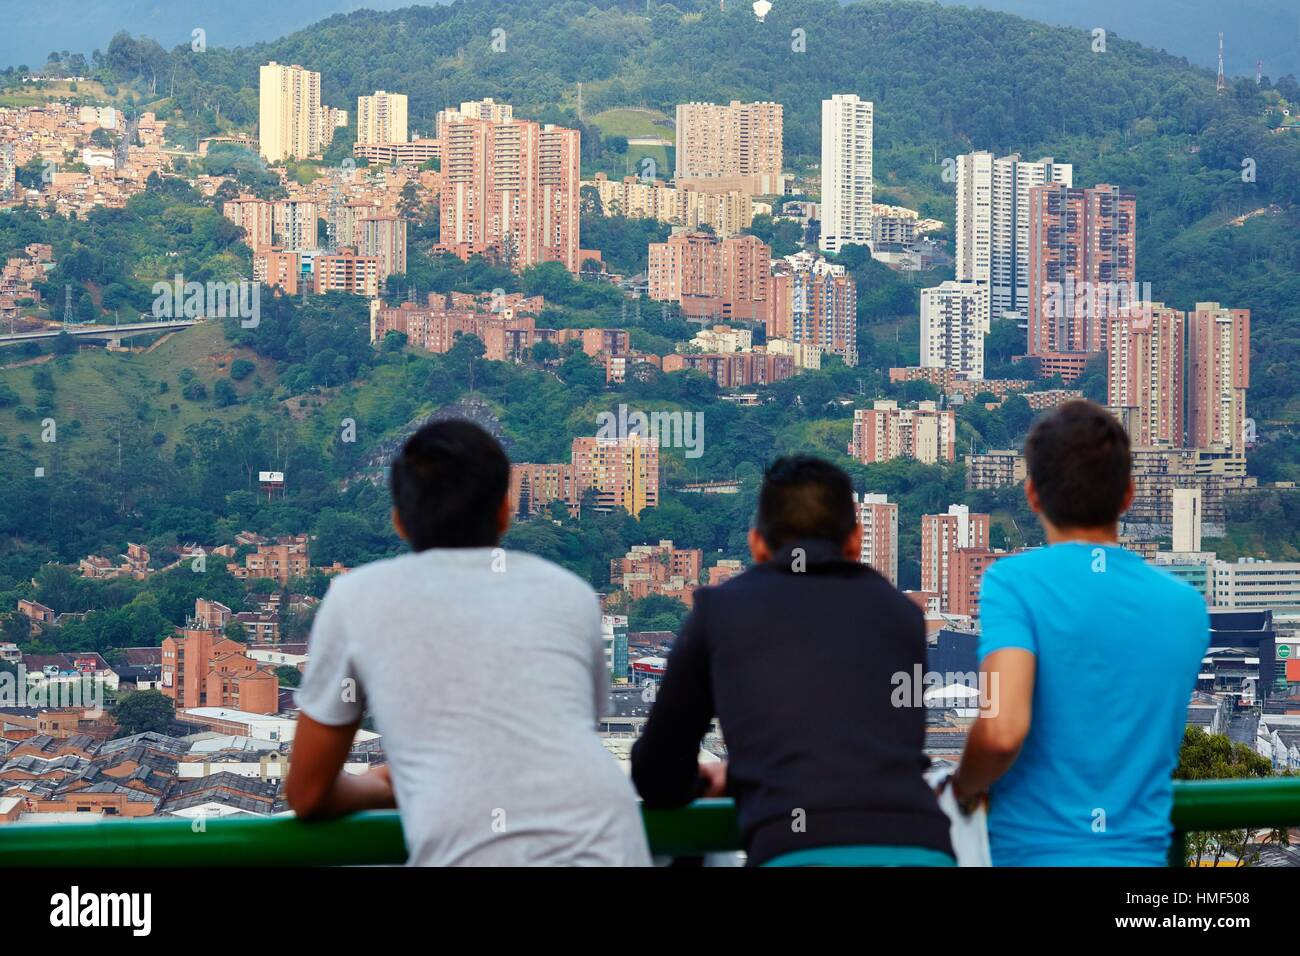 Panorama Aburra-Tal, Cerro Nutibara, Medellin, Antioquia, Kolumbien, Südamerika Stockbild